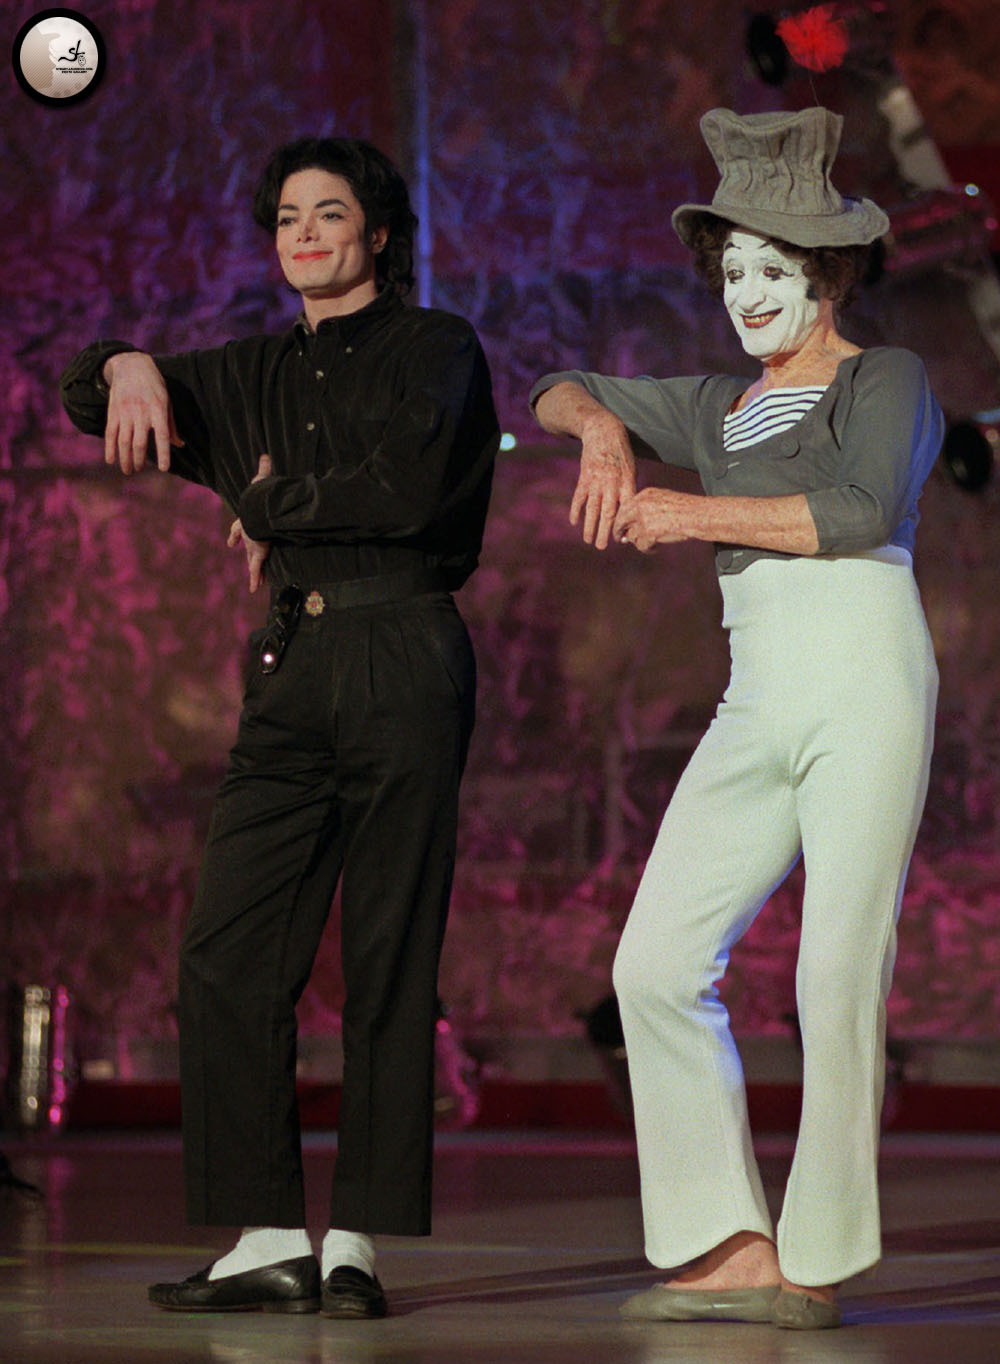 Michael with Marcel  - michael-jackson photo